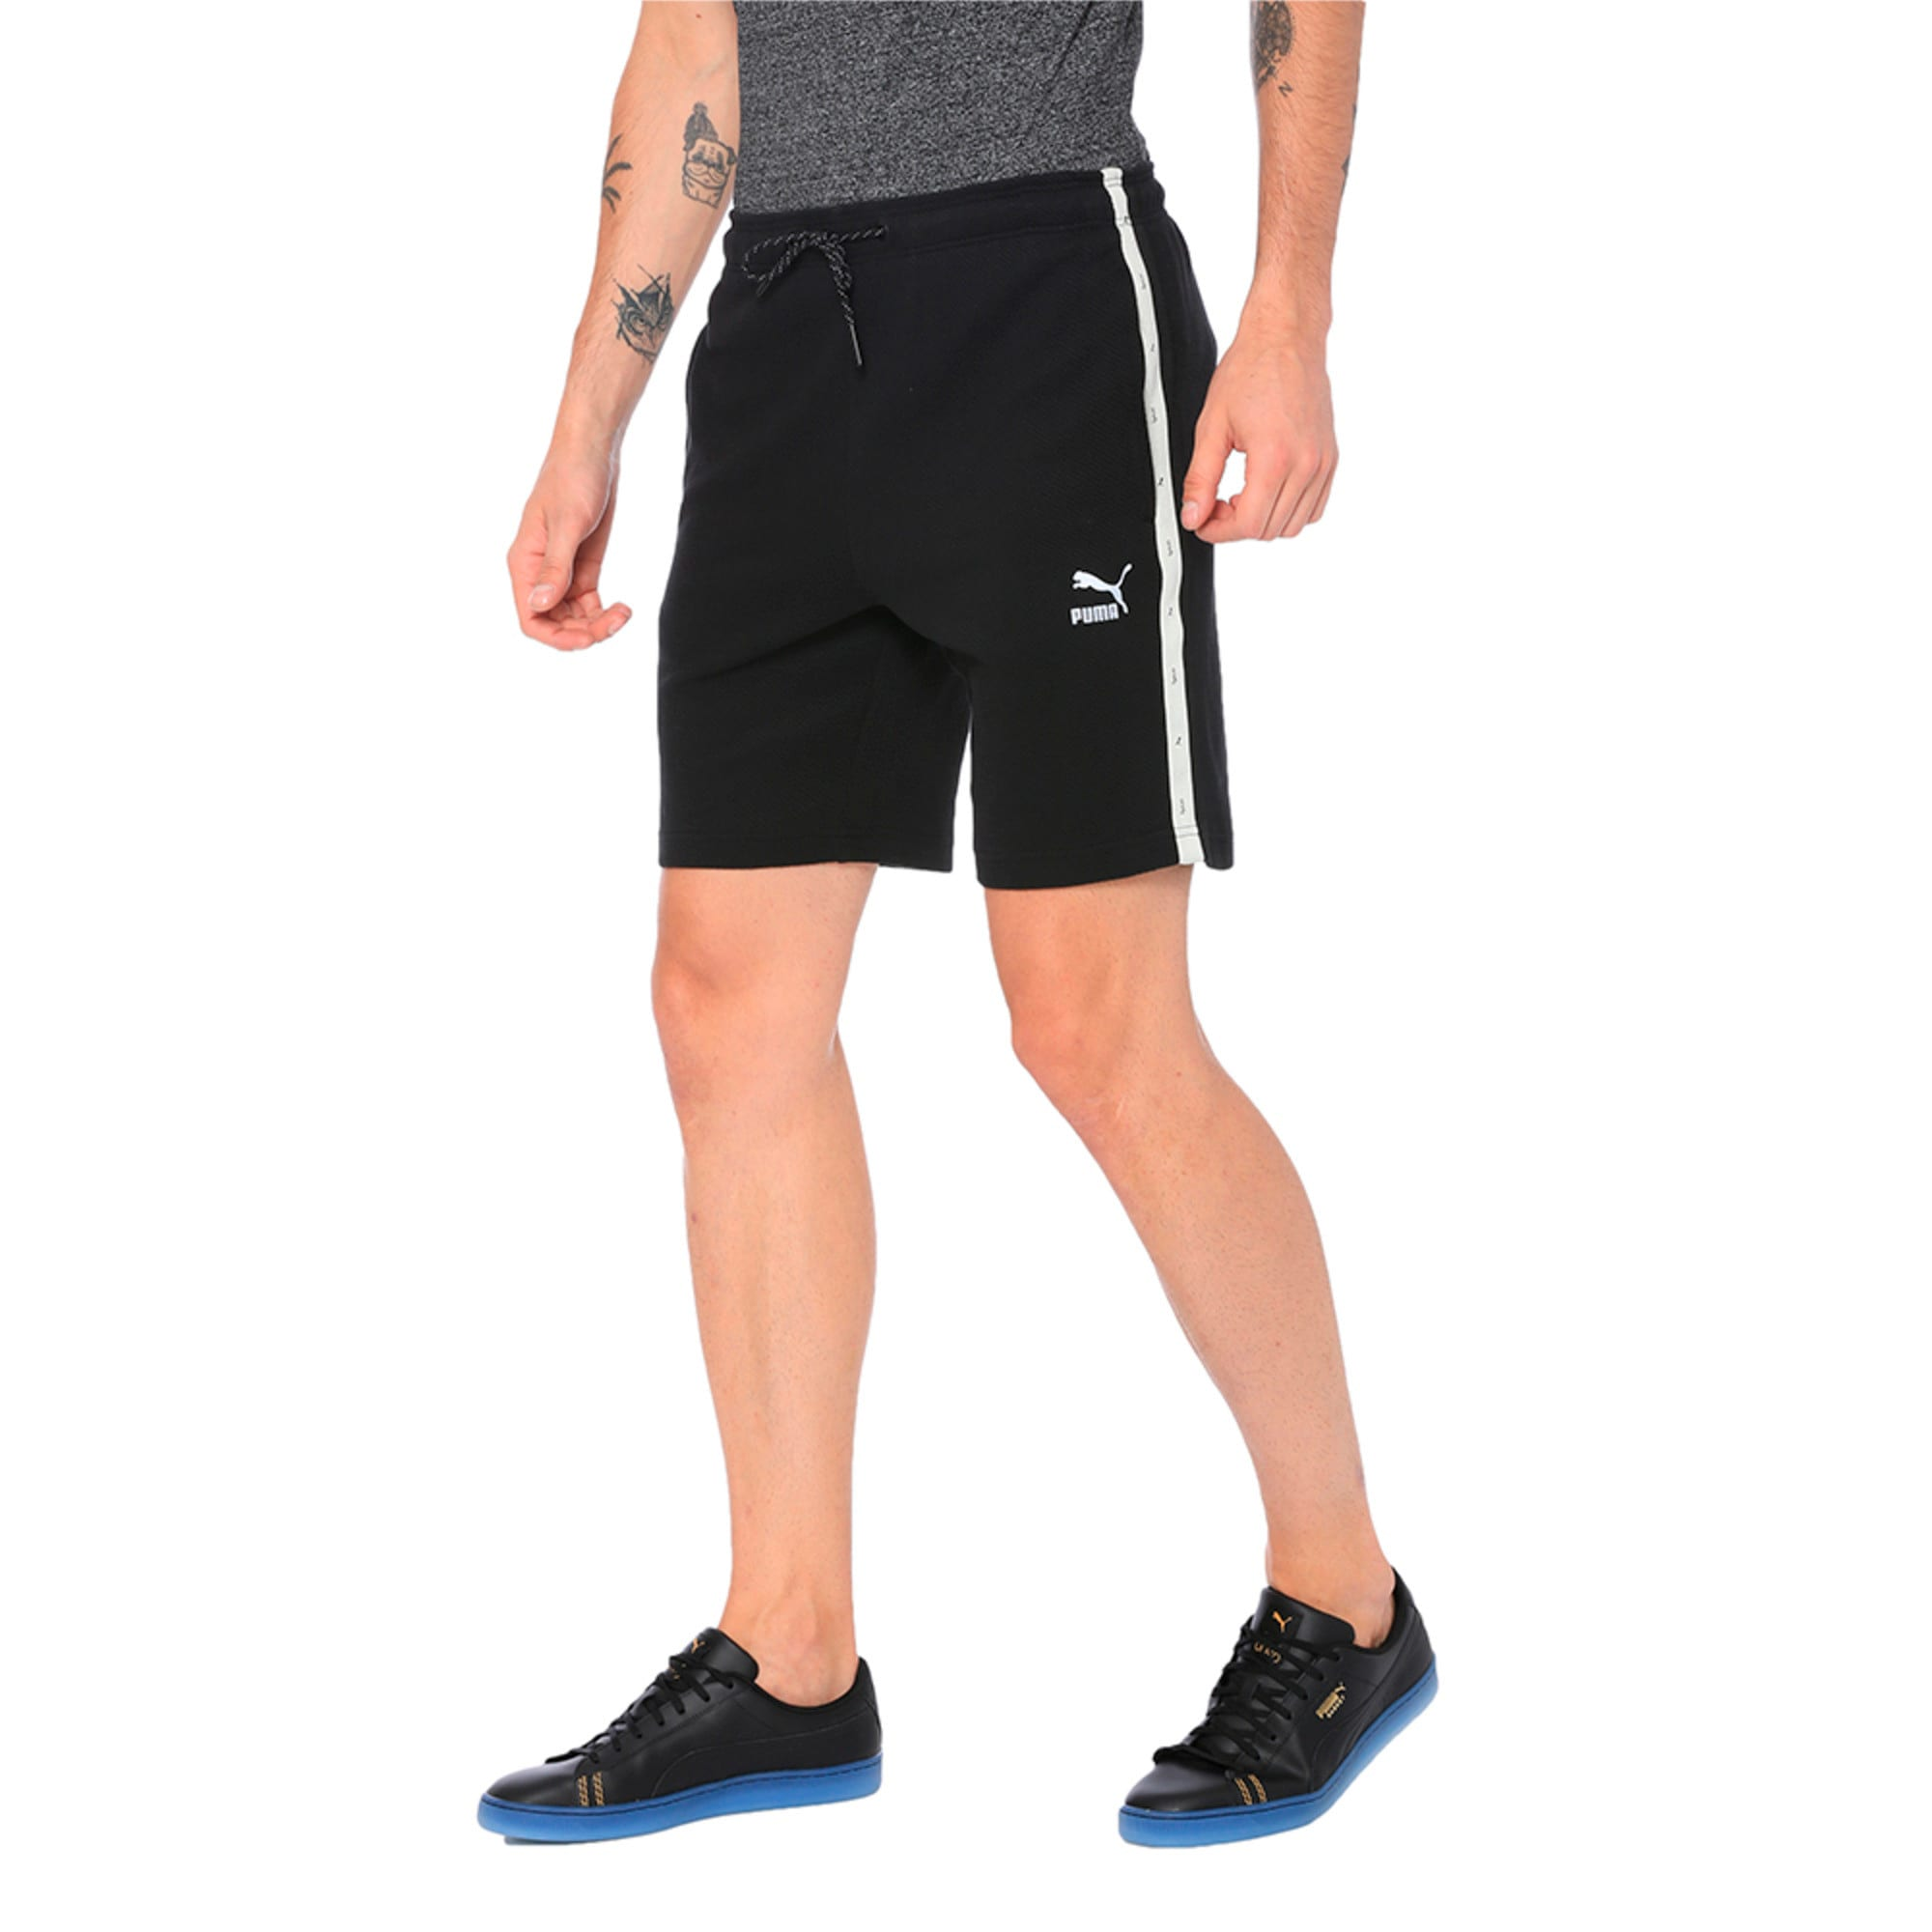 Thumbnail 3 of VK Sweat Shorts, Puma Black, medium-IND